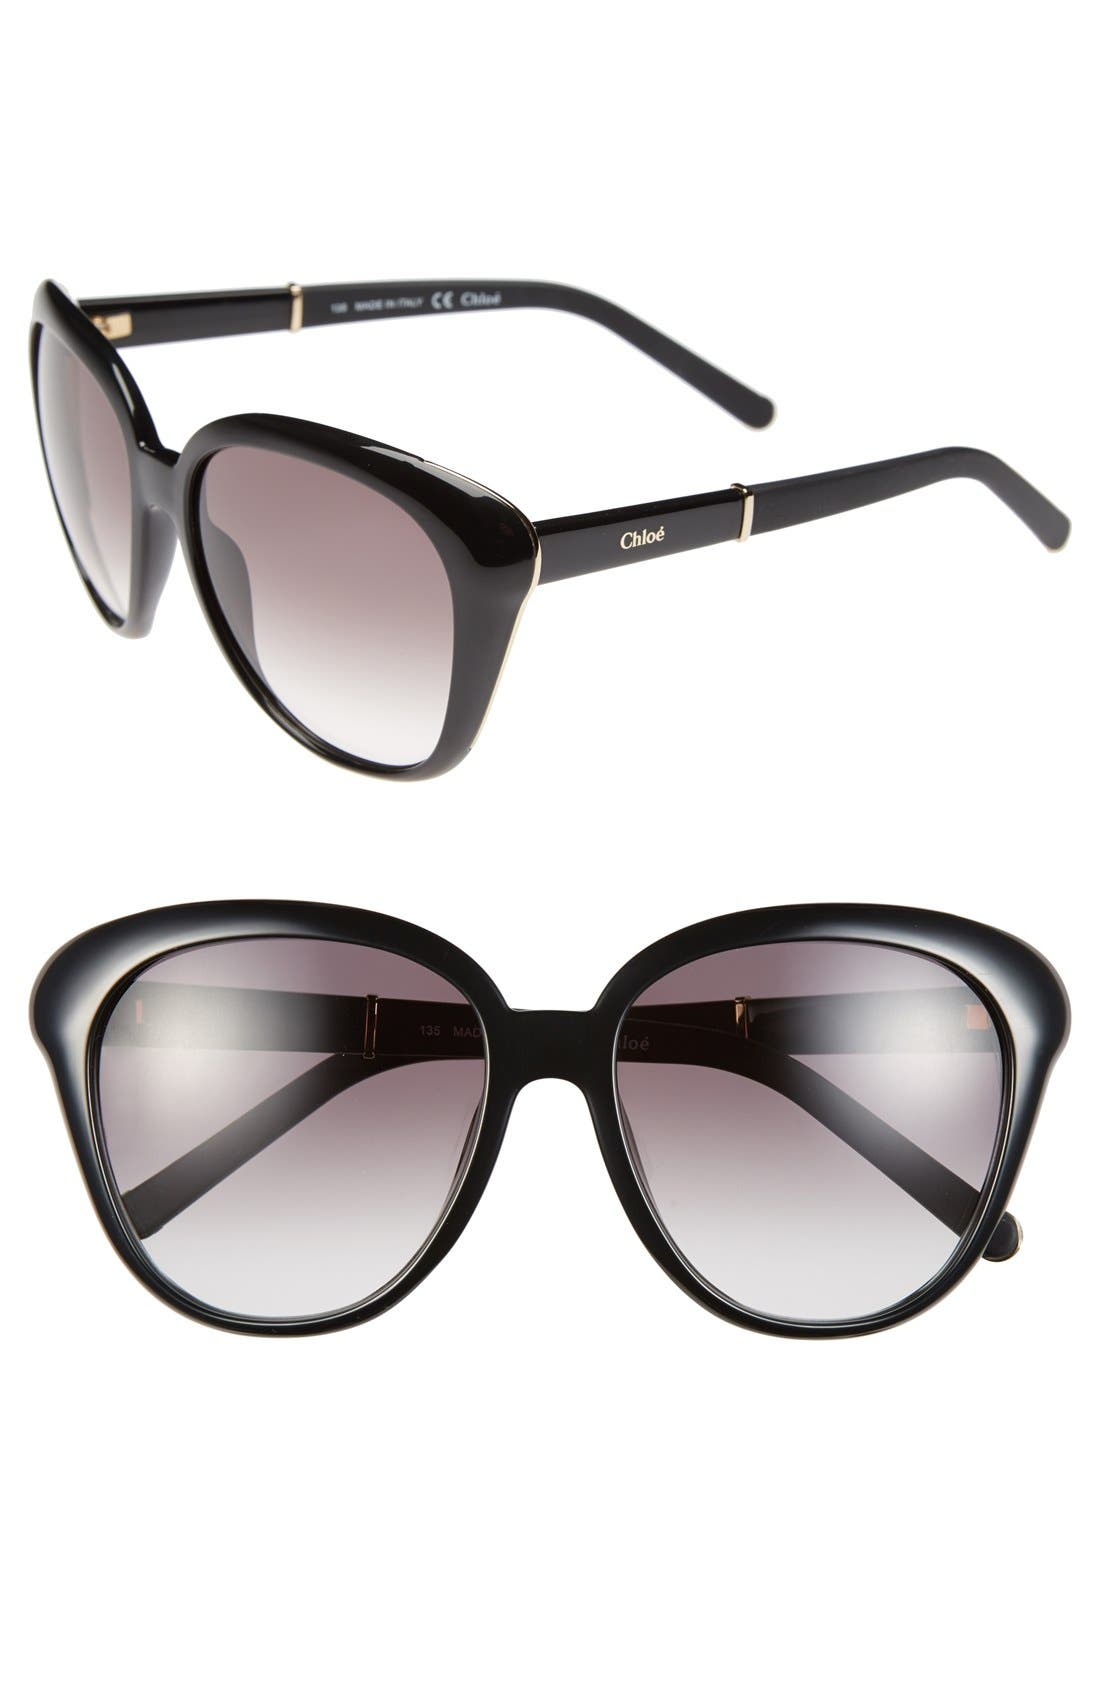 Chloé 55mm Cat Eye Sunglasses